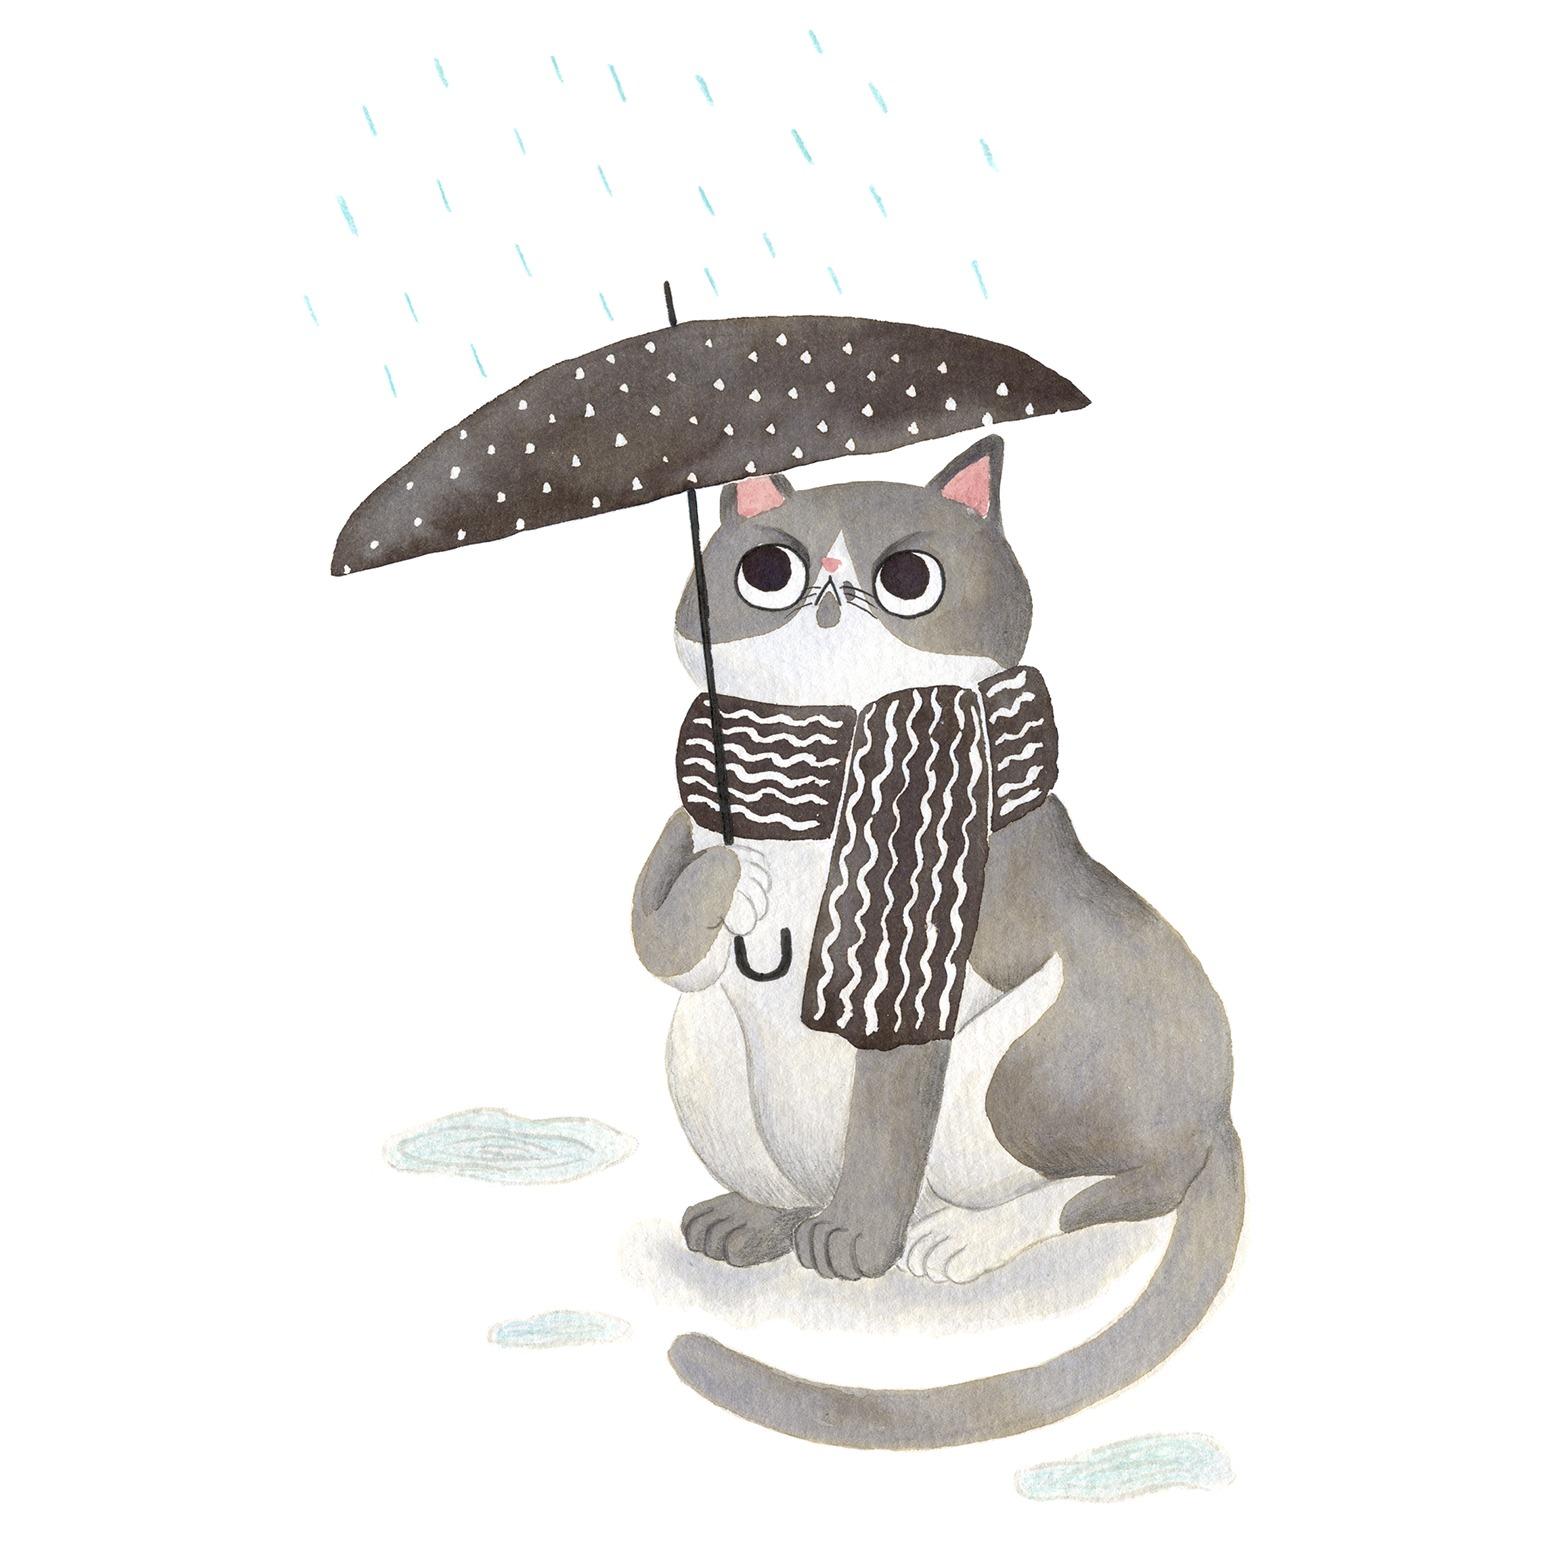 gato con paraguas, Ilustración de gato, Inktober, gato gordo, retrato de gato